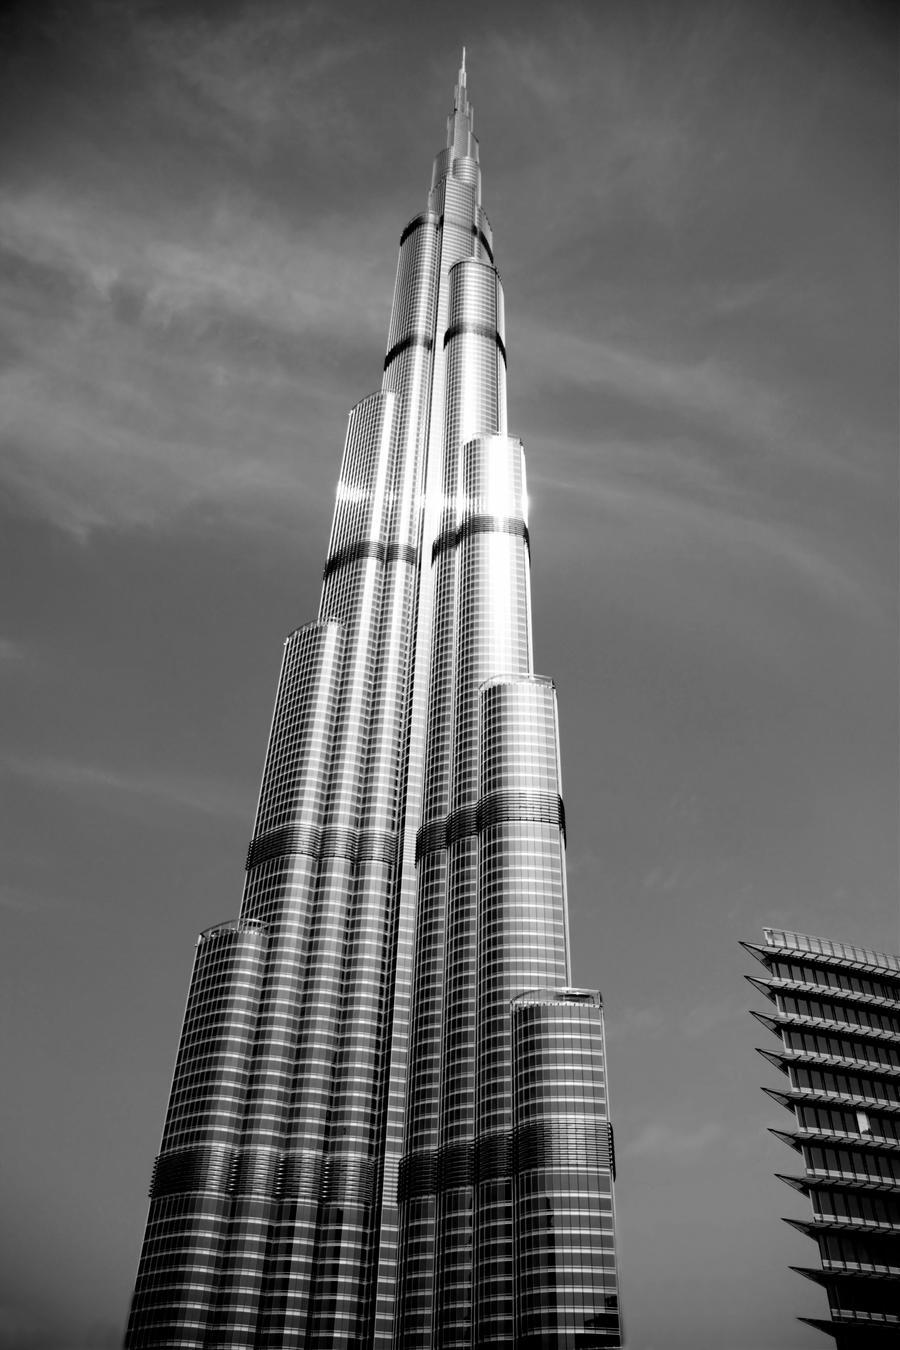 Dubai - Burj Khalifa 03 by GiardQatar